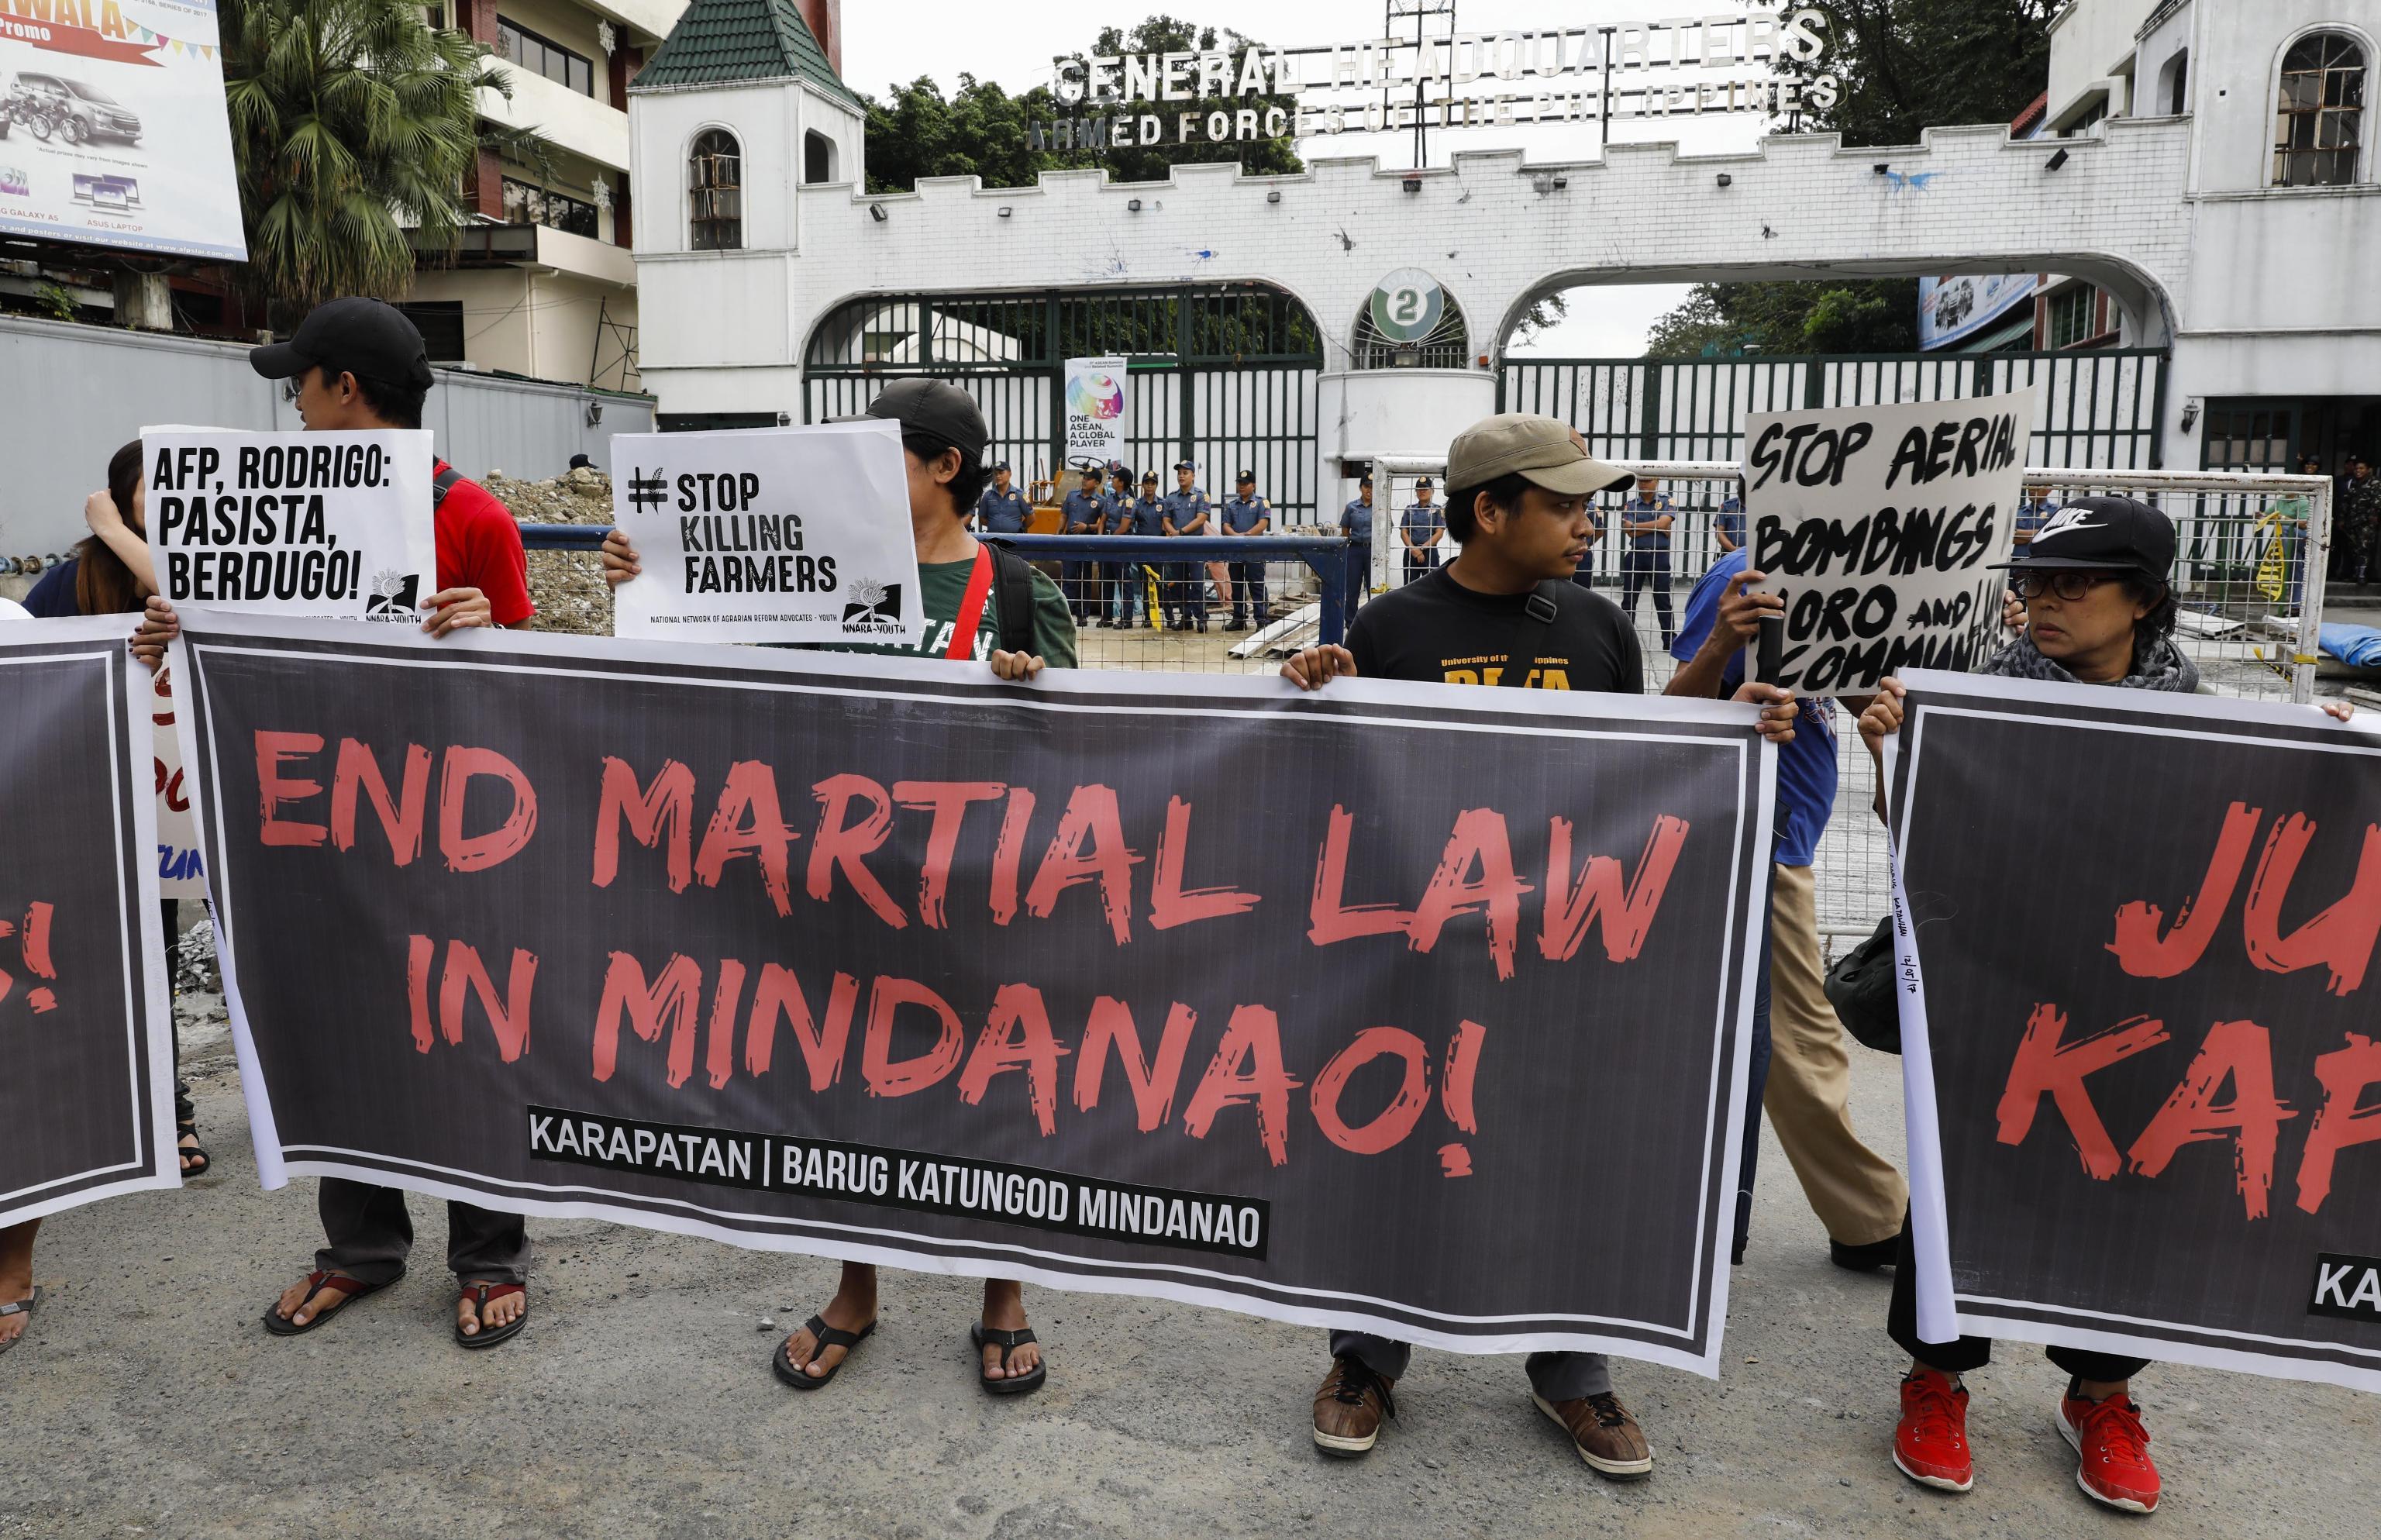 Filippine, ok legge marziale al sud